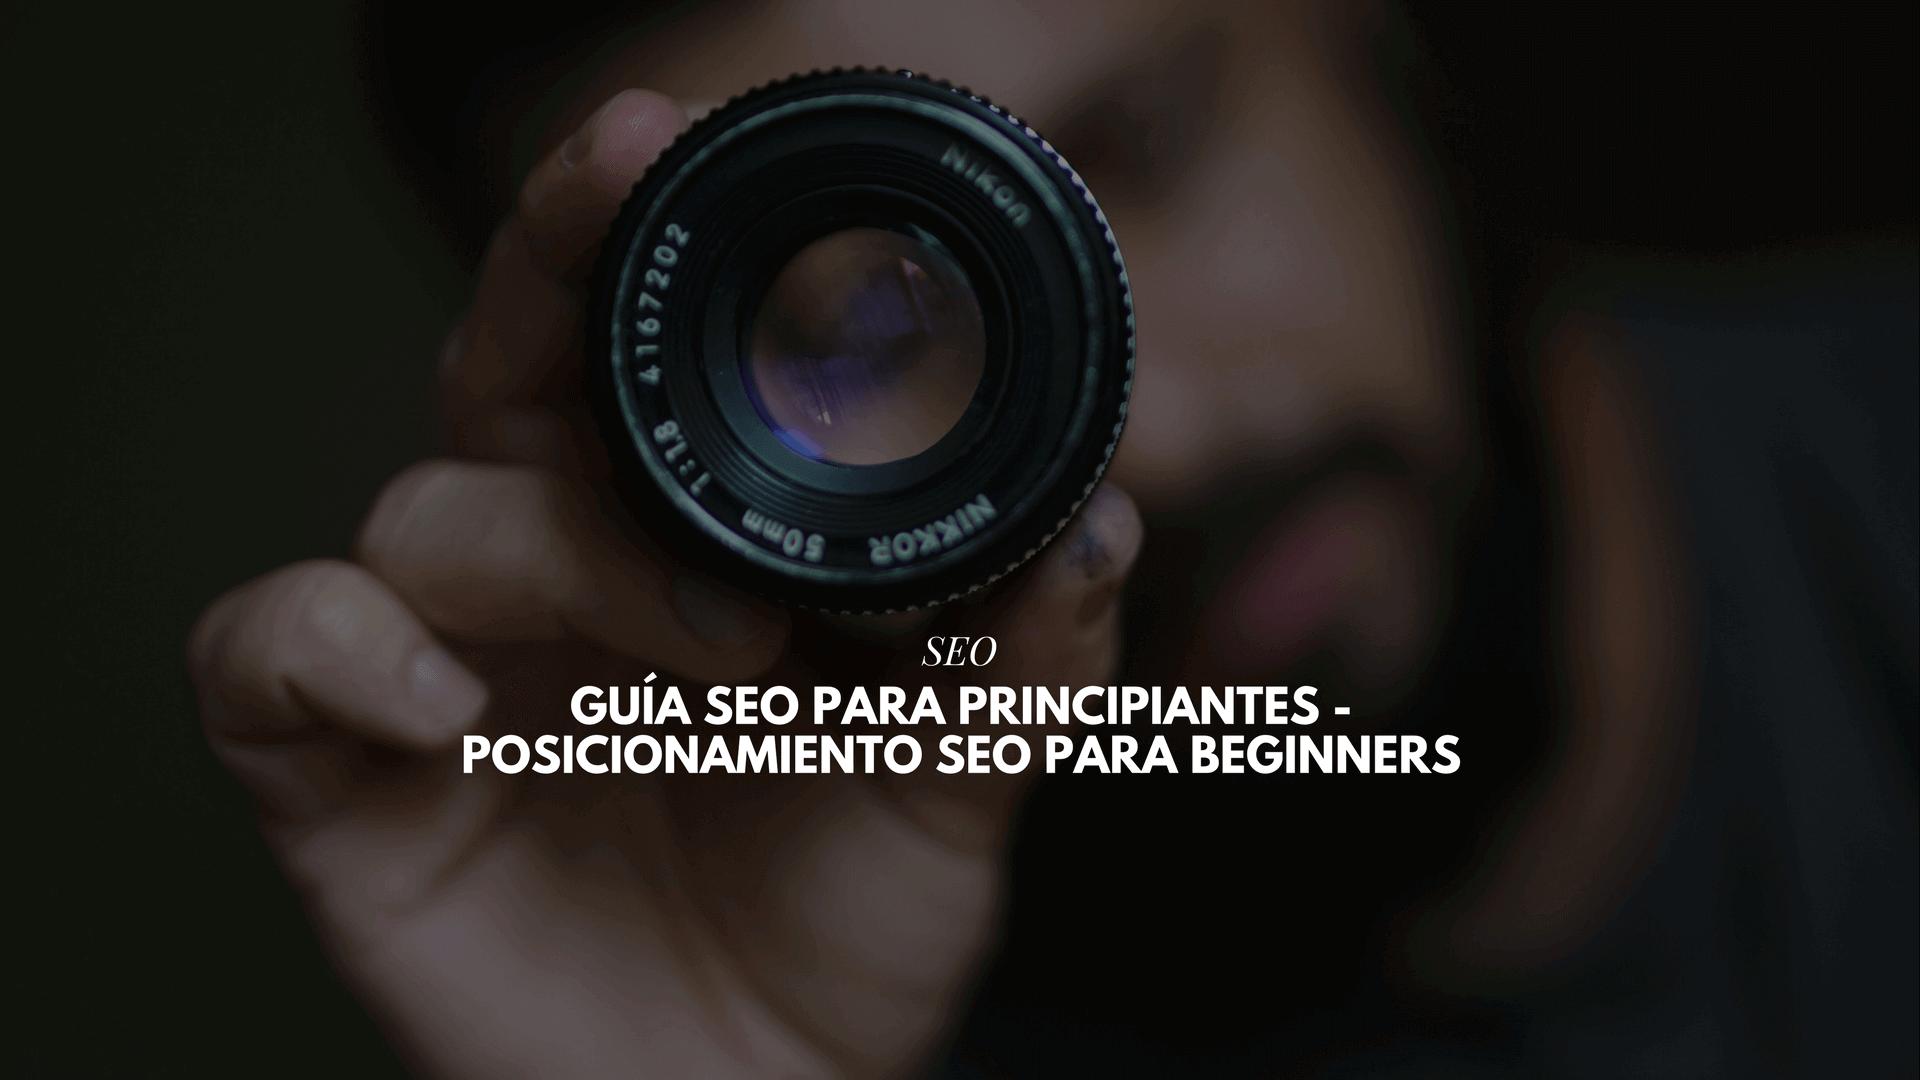 Guía SEO para principiantes – Posicionamiento SEO para beginners